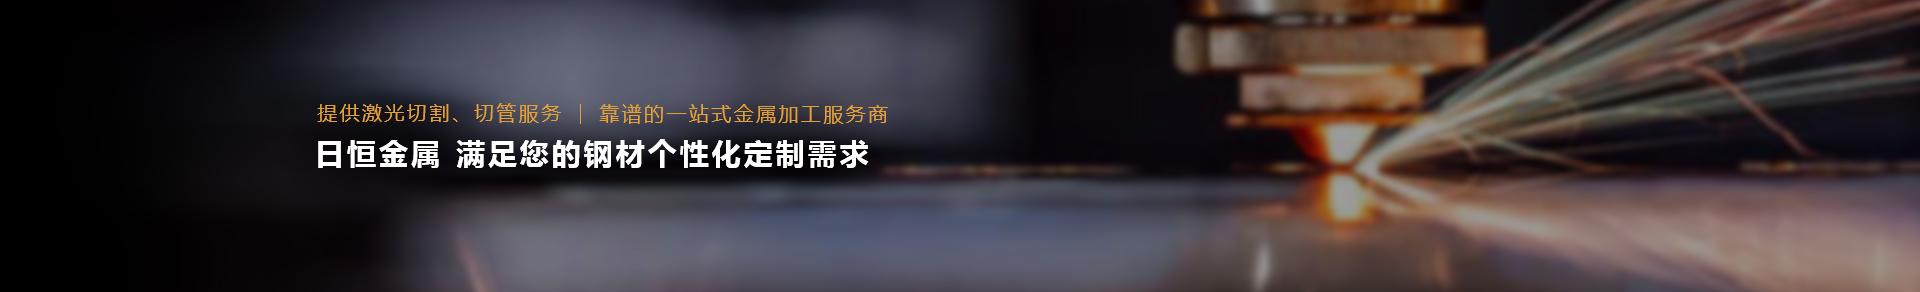 http://www.qdrhjs.cn/data/upload/202002/20200213101846_258.jpg